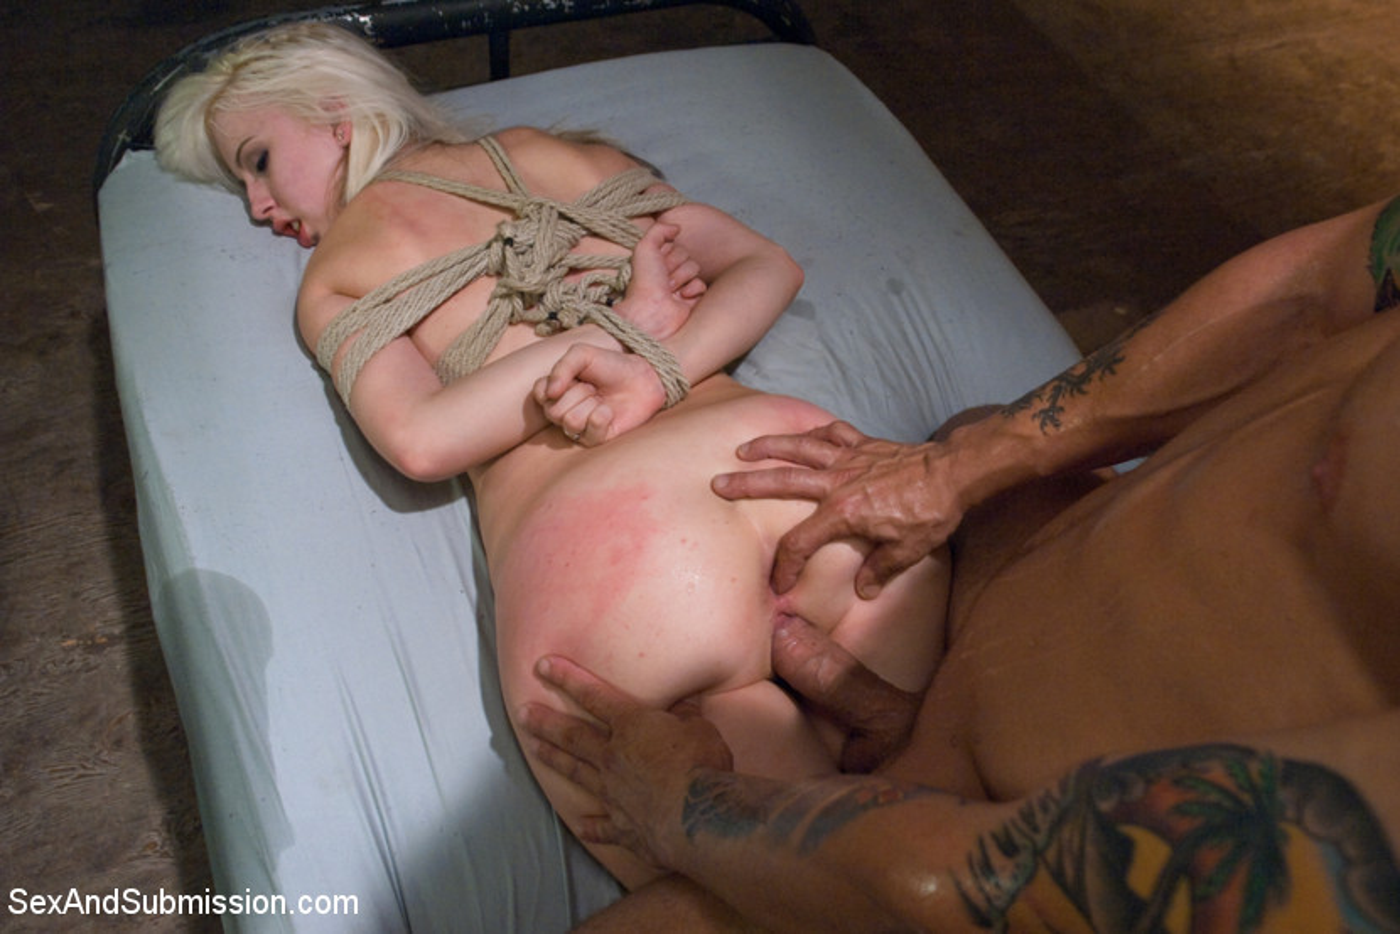 Maledom Porn: Top Videos: 1 - Hardcore sex tube